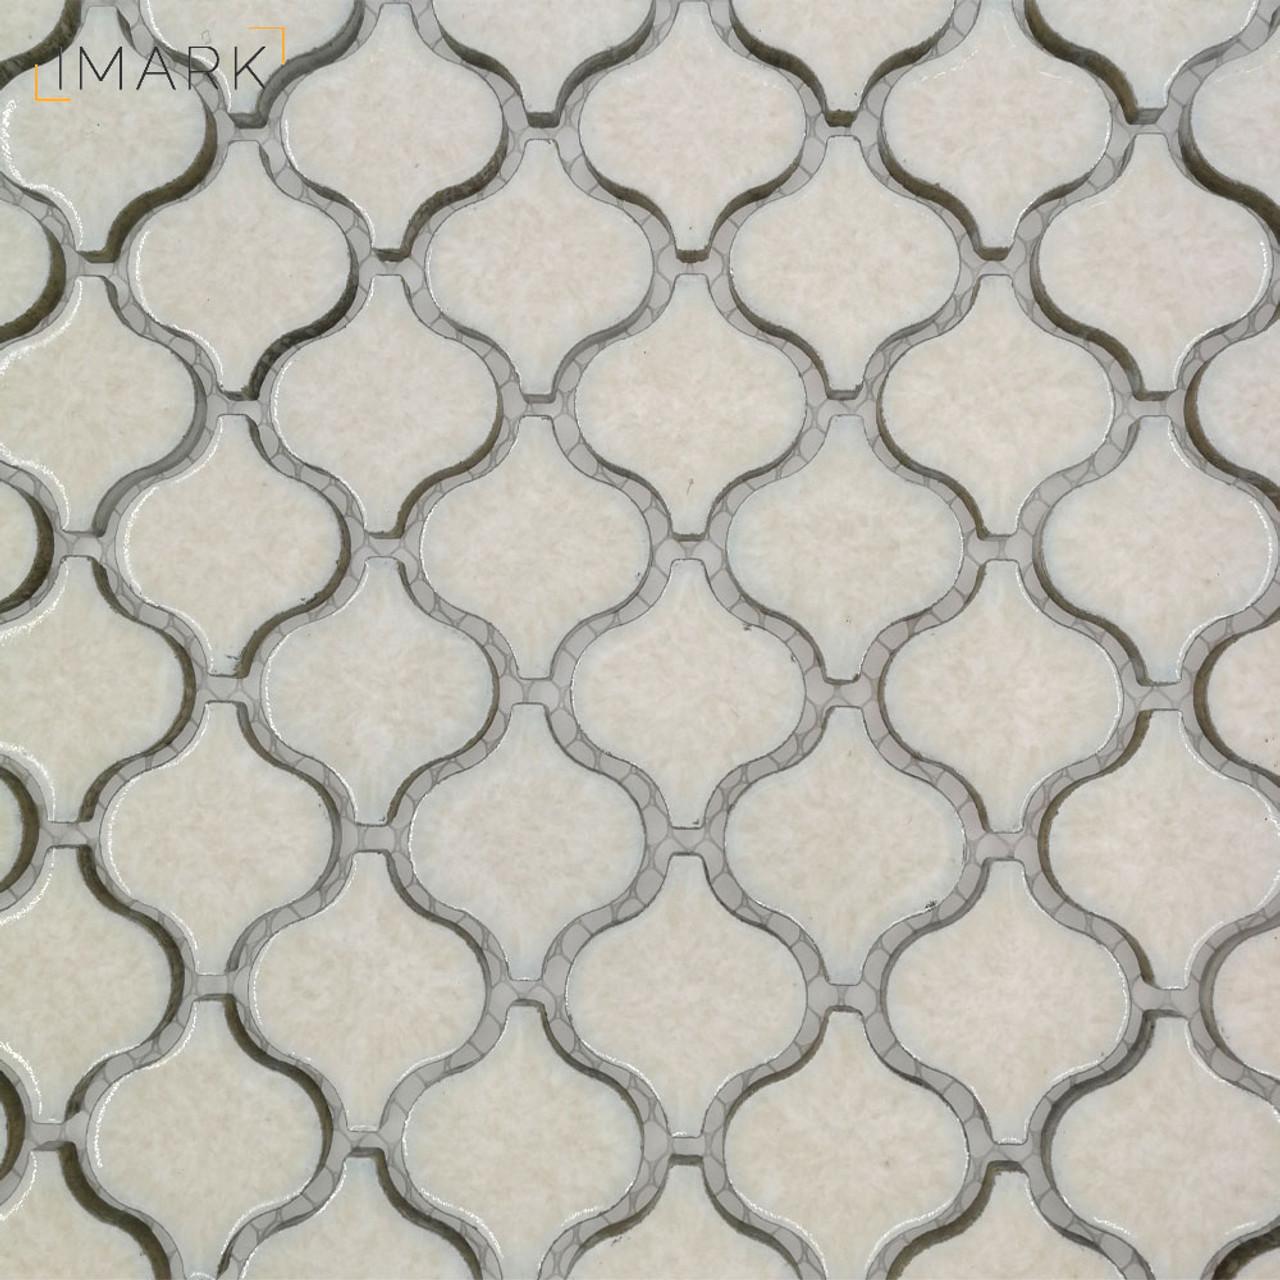 Lantern Glossy White Porcelain Ceramic Mosaic Tile For Backsplash ...